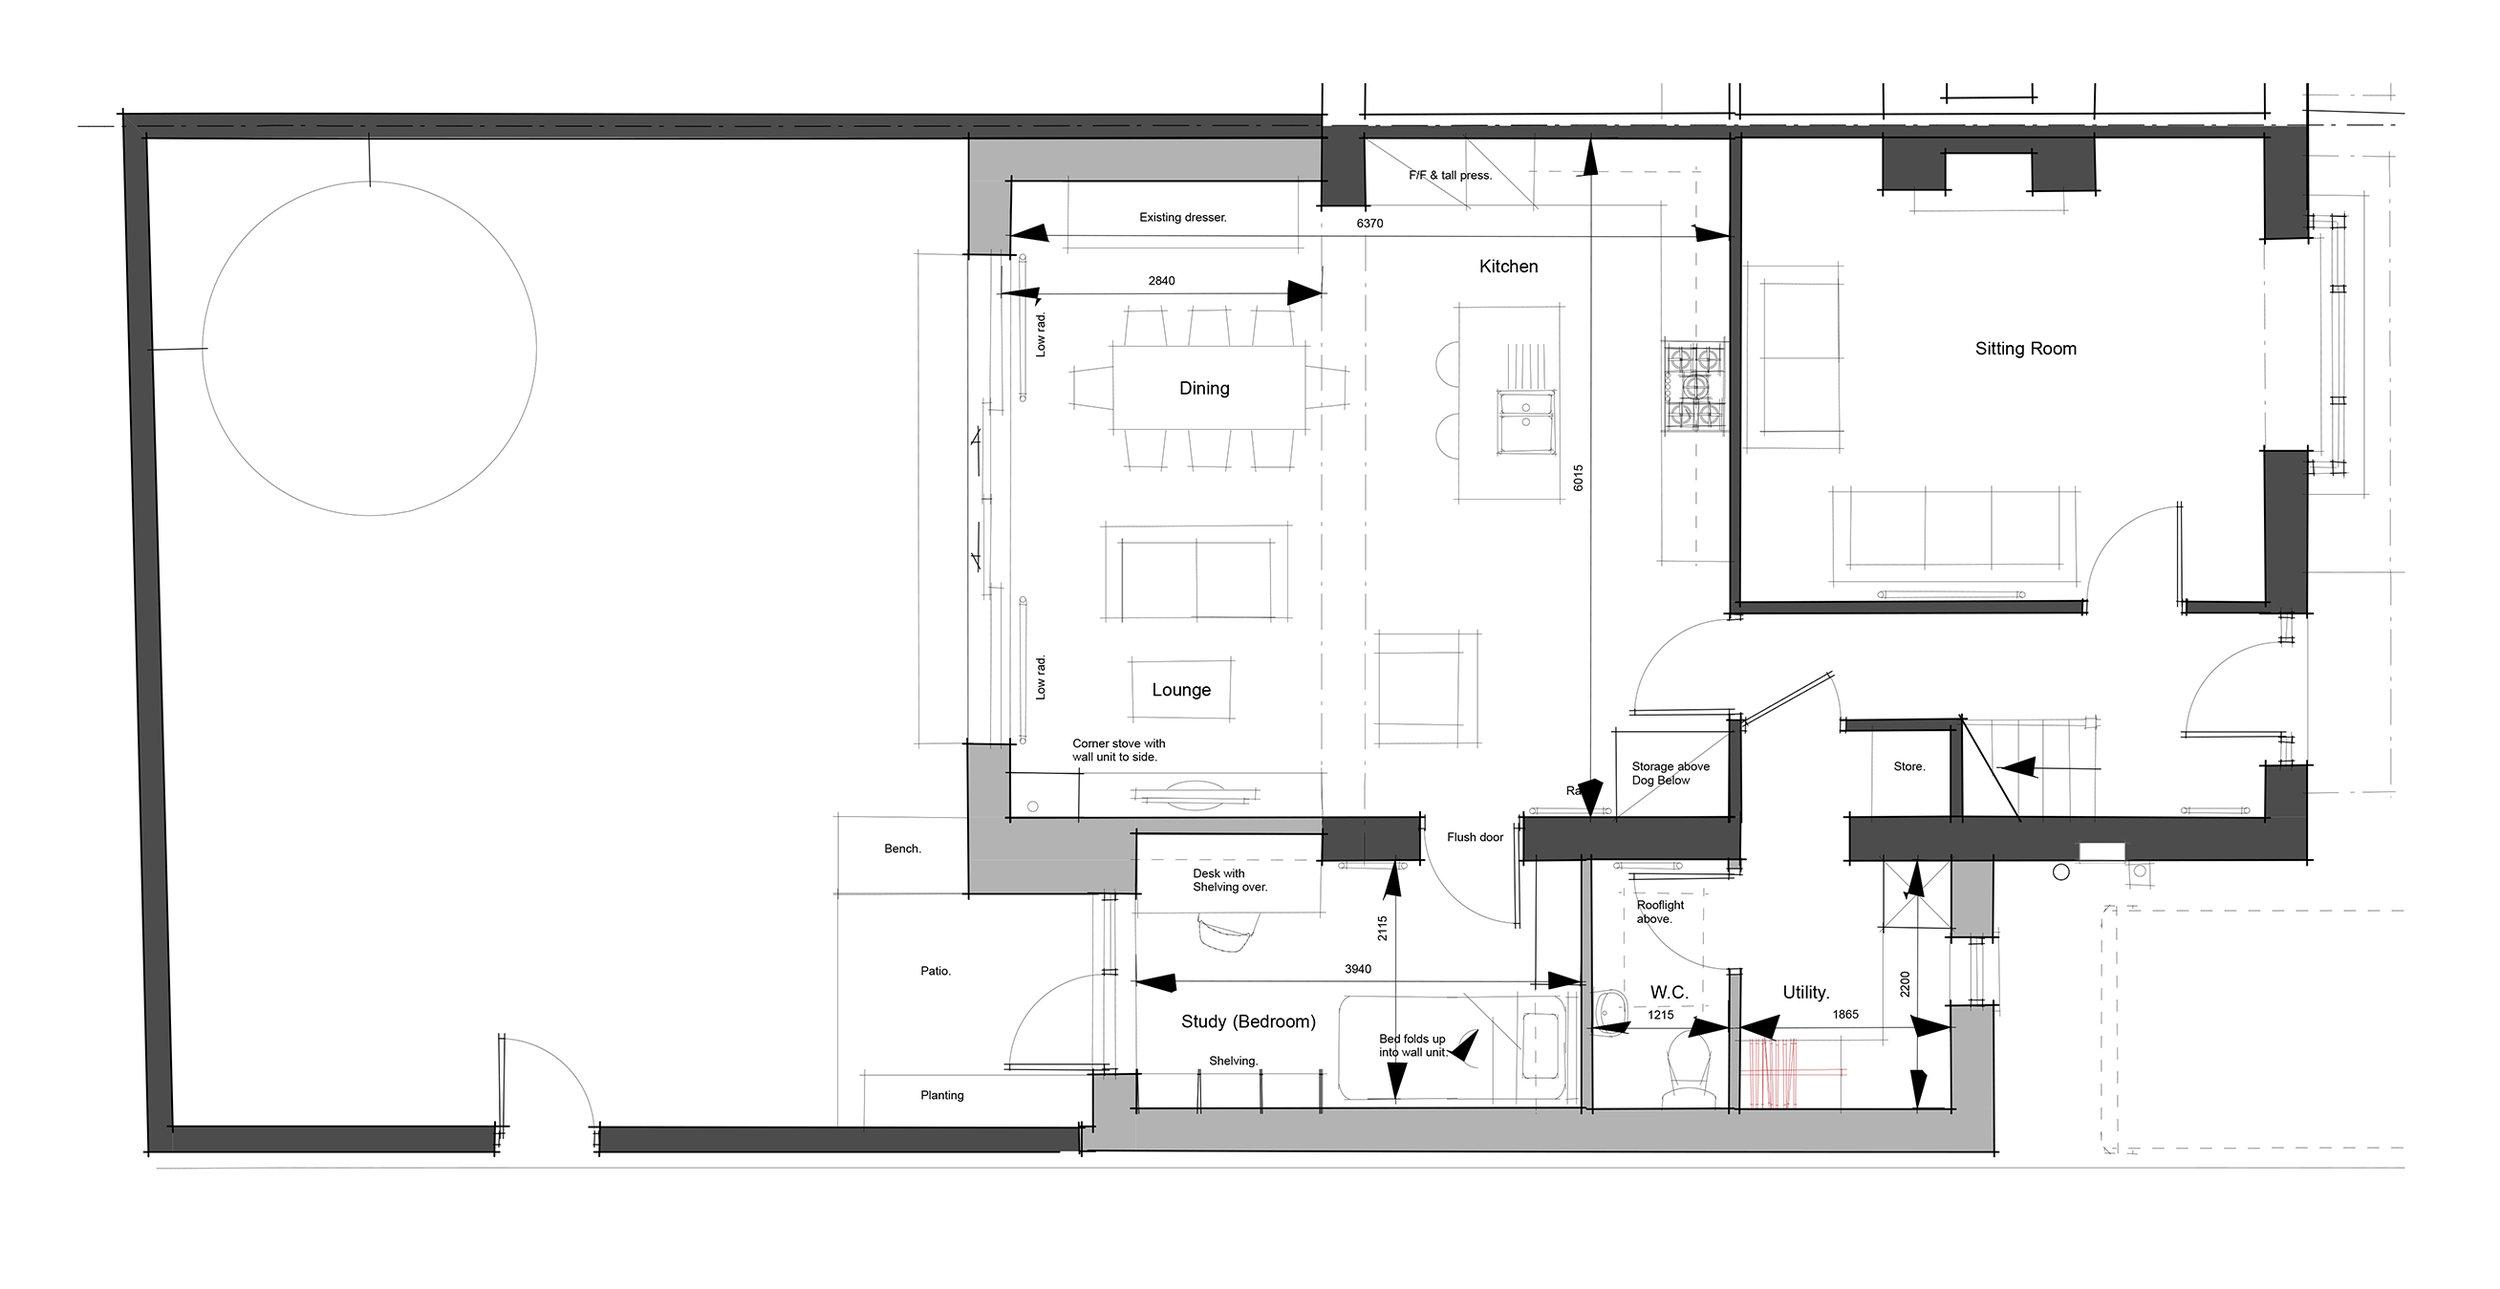 Extend_House_Architect_Dublin_RIAI_Design_Plan.jpg